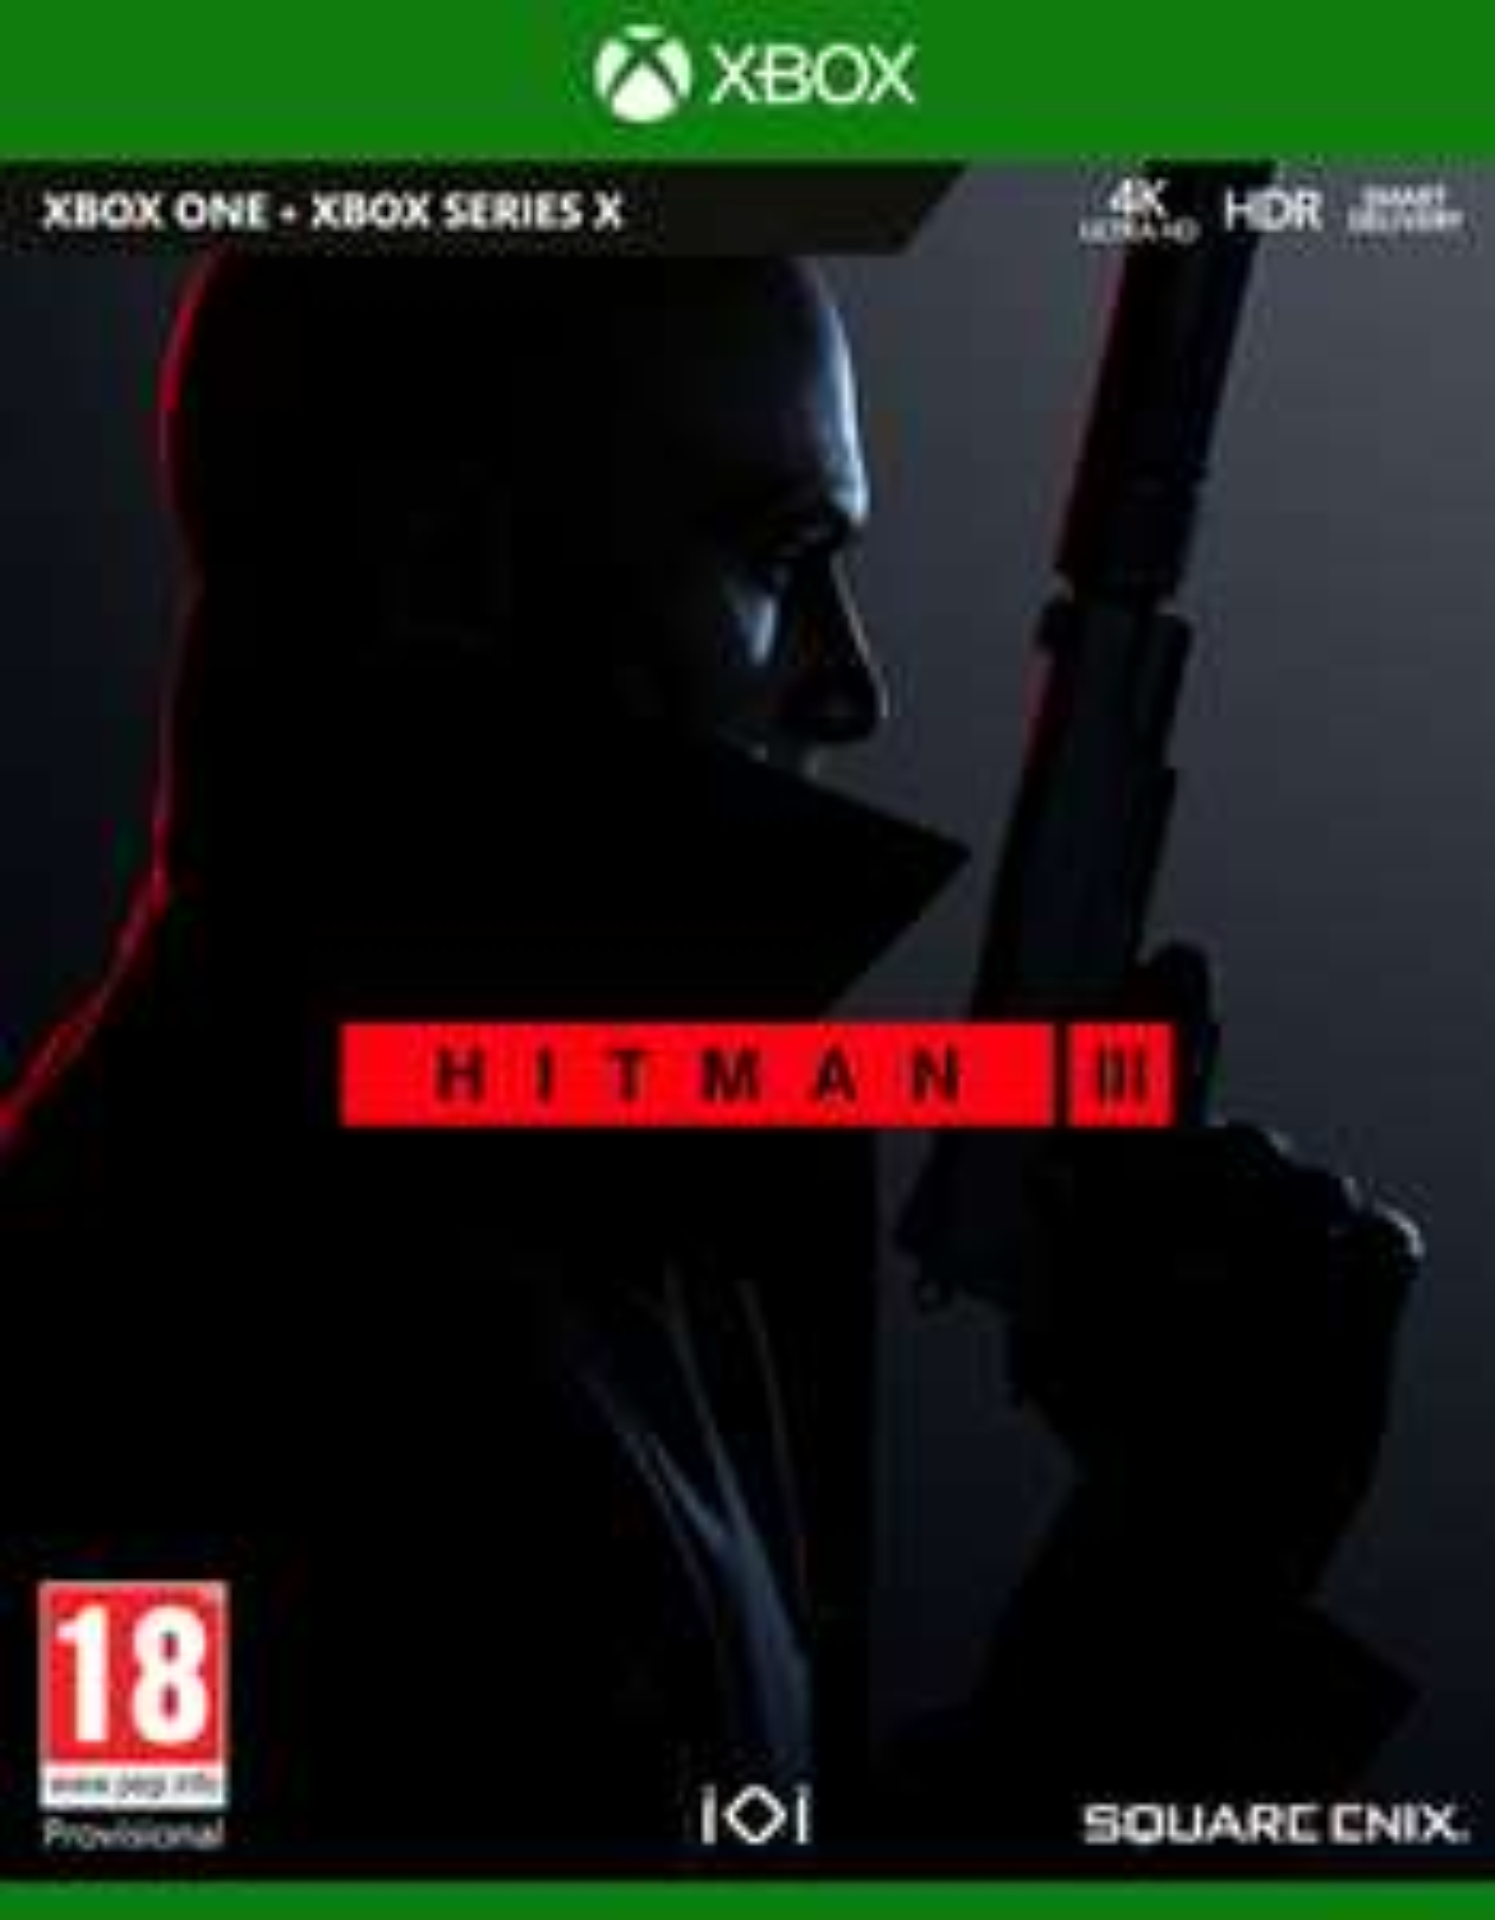 Hitman 3 - Xbox key (Series X | S, Xbox One)